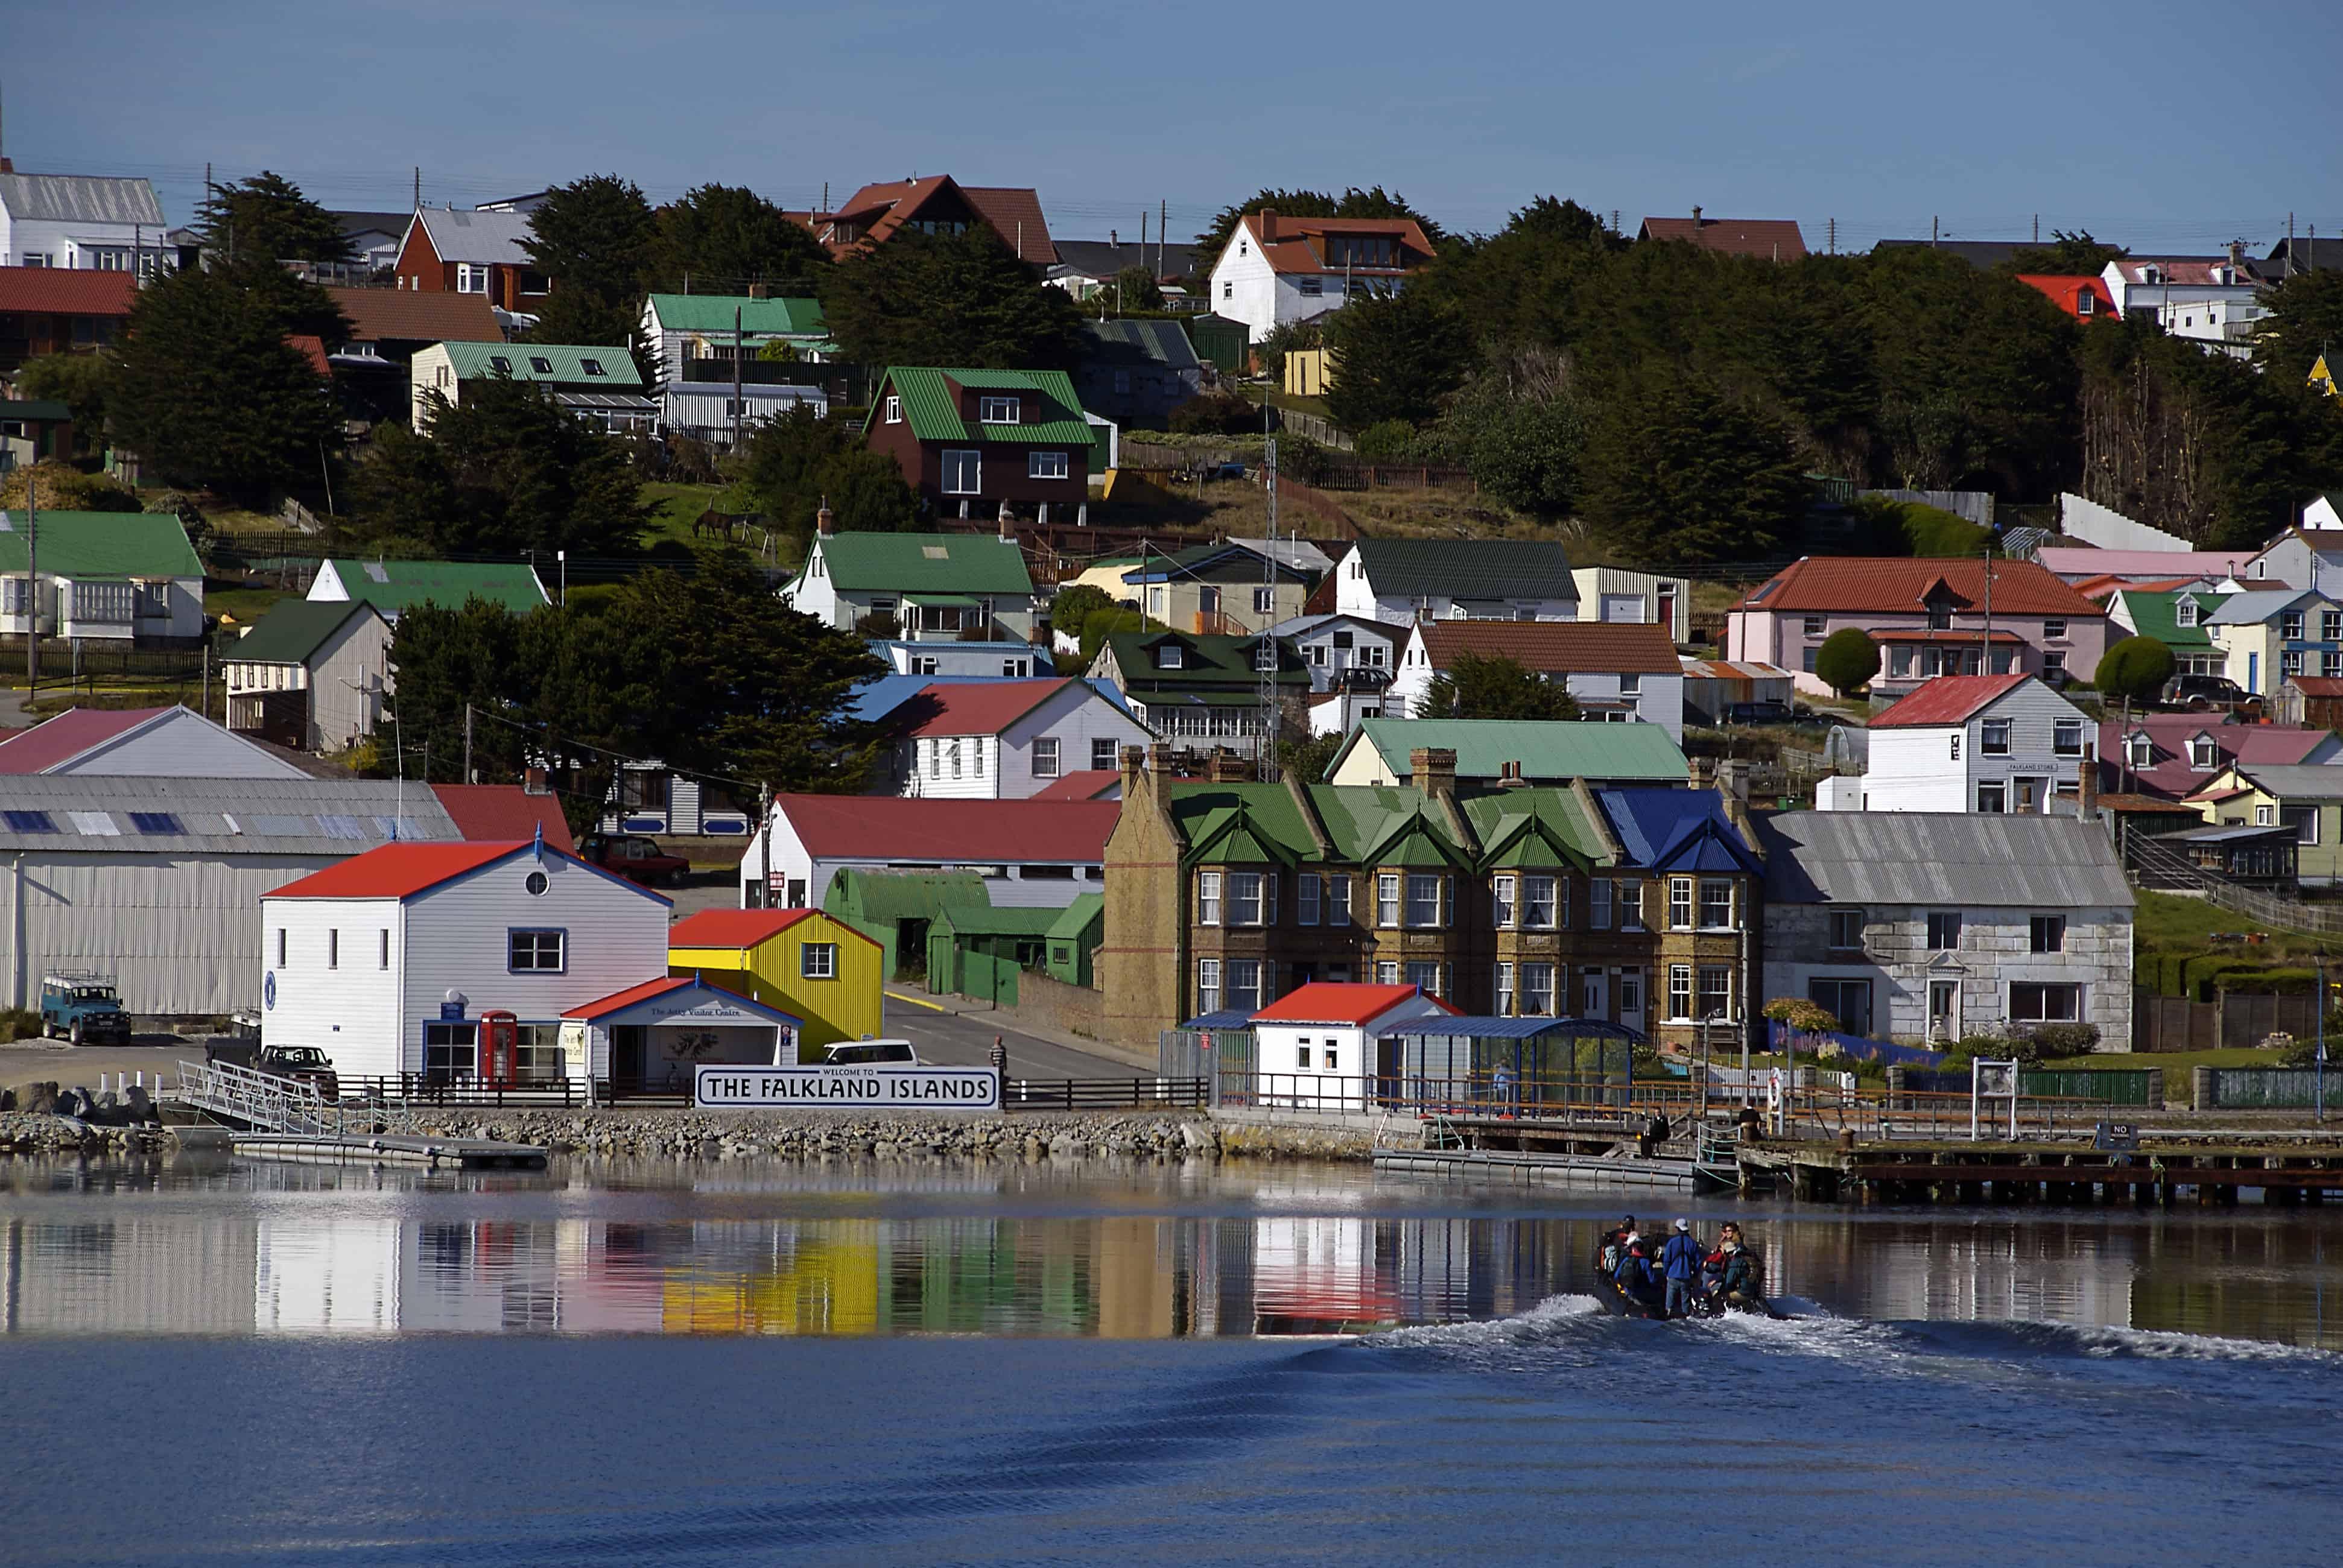 Stanley Falkland Islands